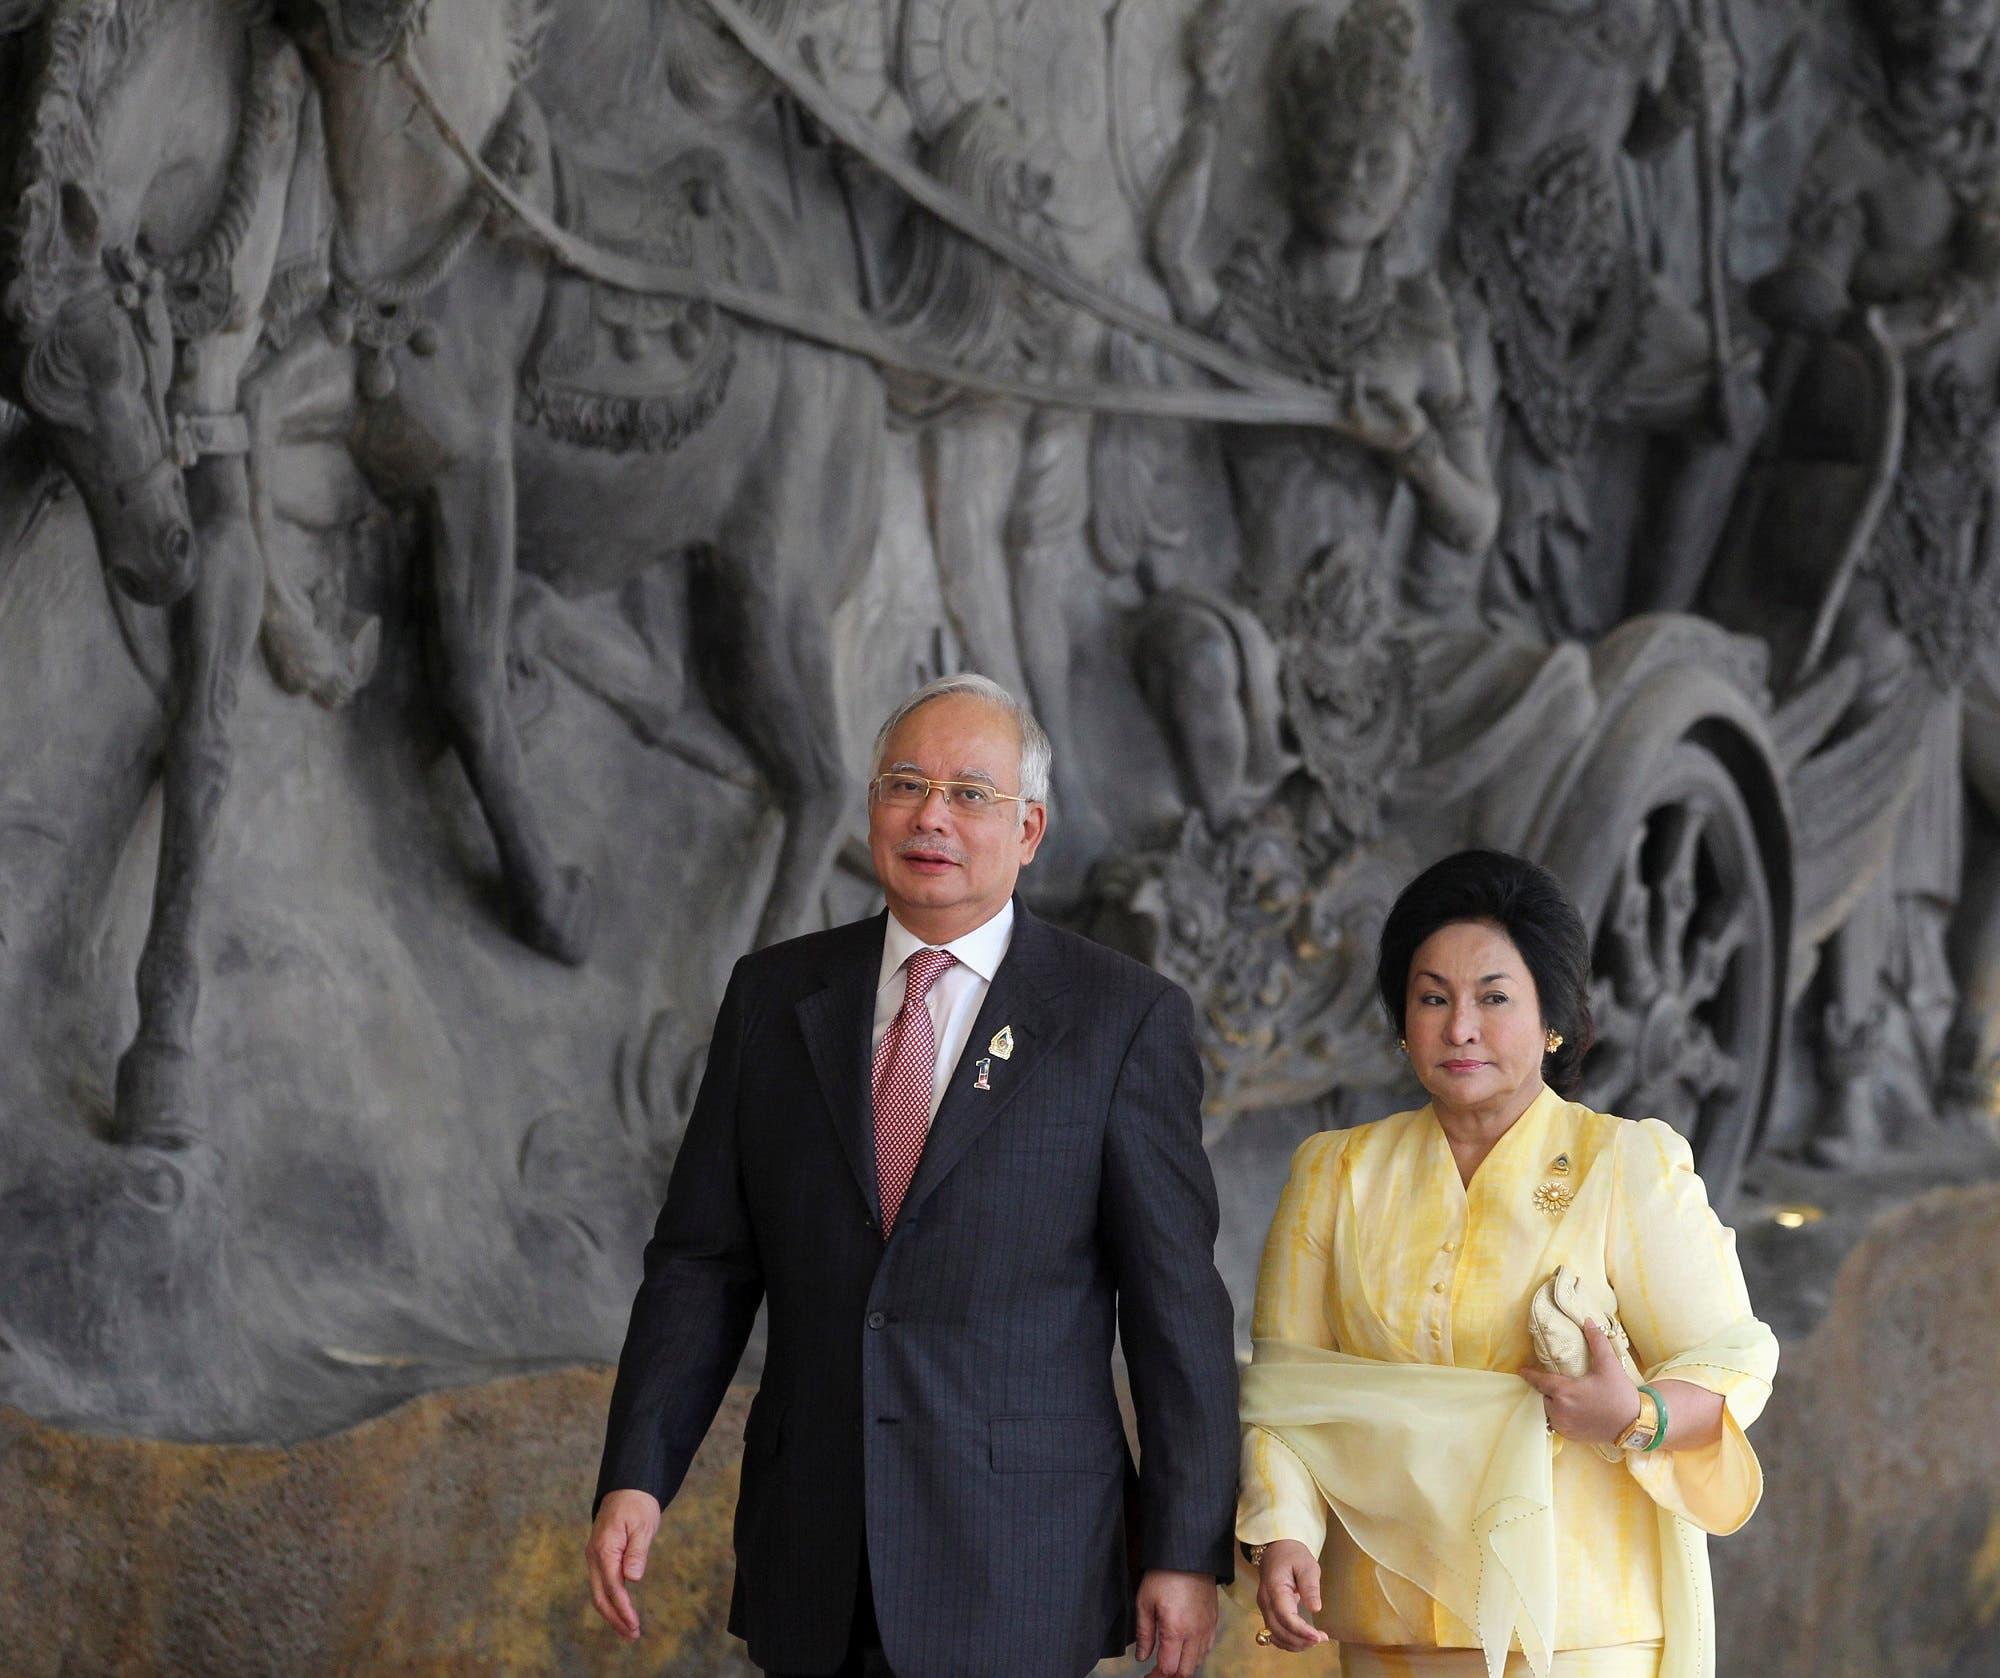 Prime Minister Najib Razak and his wife Rosmah Mansor arrive for ASEAN Summit in Nusa Dua, Bali, on November 17, 2011. (Reuters)